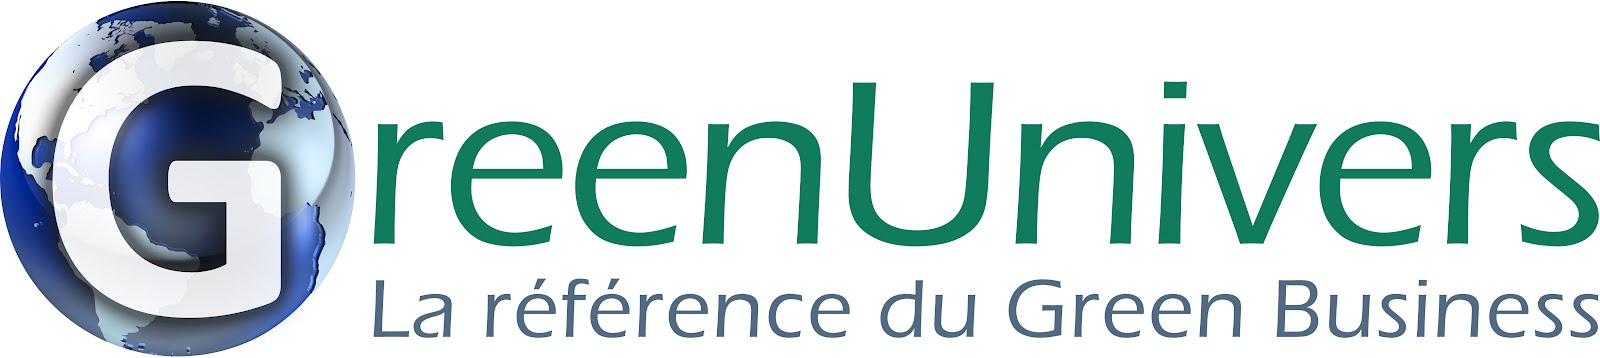 Logo-GreenUnivers-HQa4